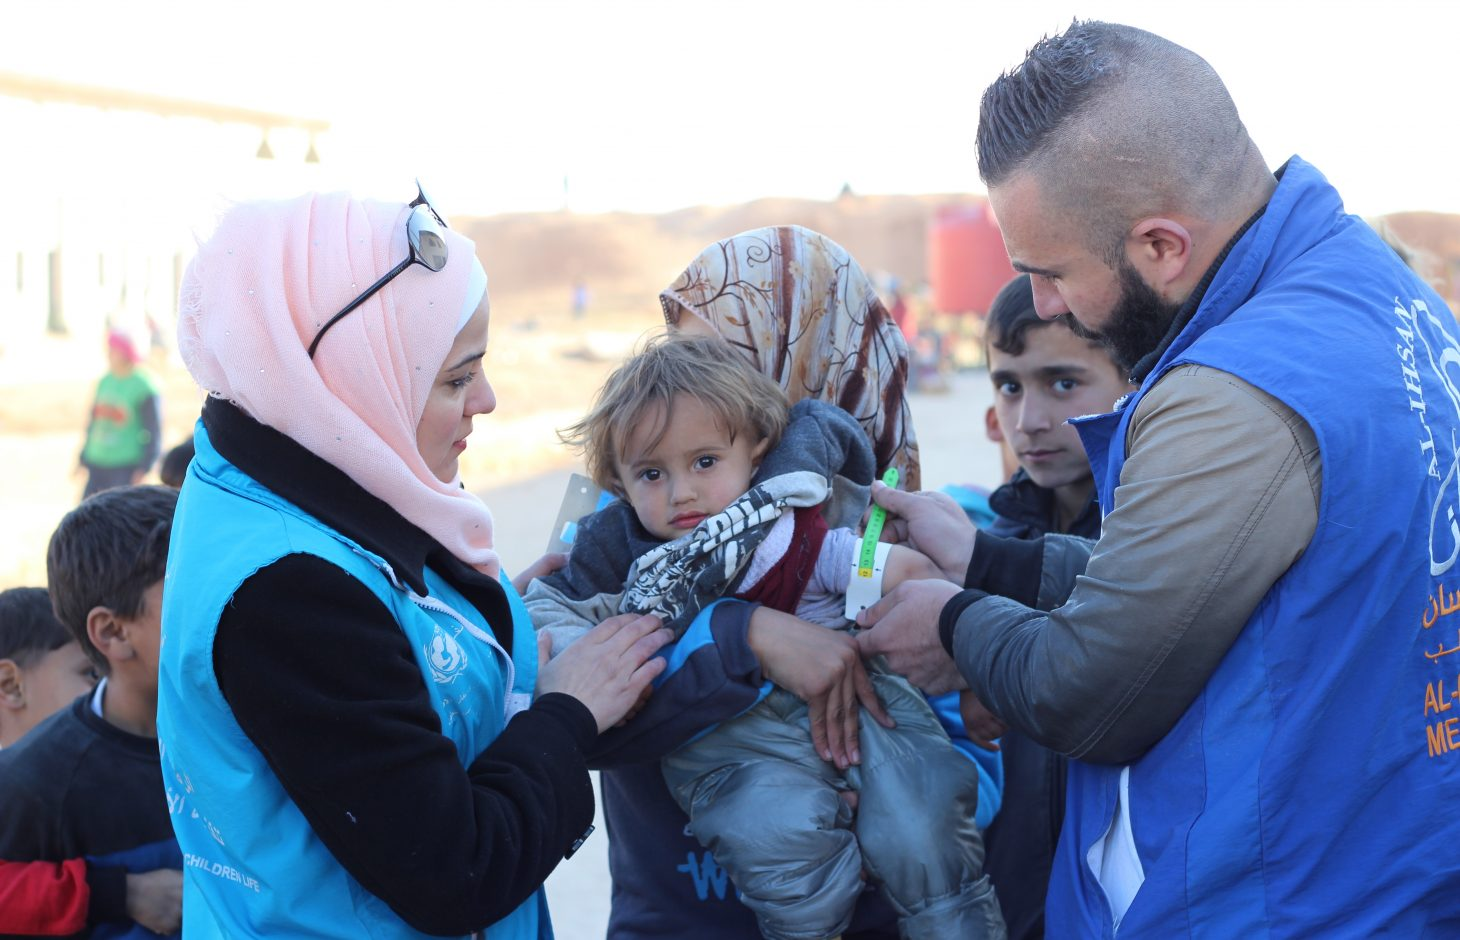 UNICEF_2016_Dec-7_Aleppo_Jibreen_IDPs_response_Al-Issa_IMG_7235